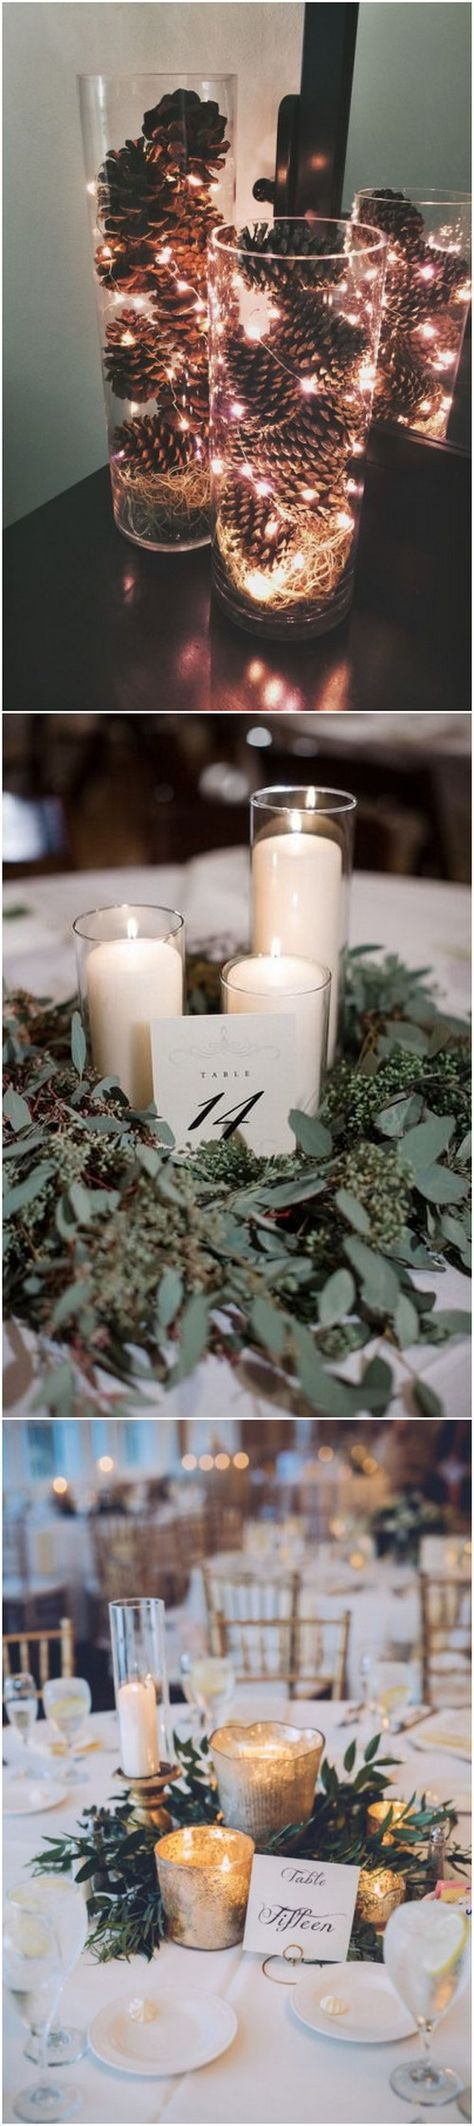 gorgeous winter wedding centerpiece ideas